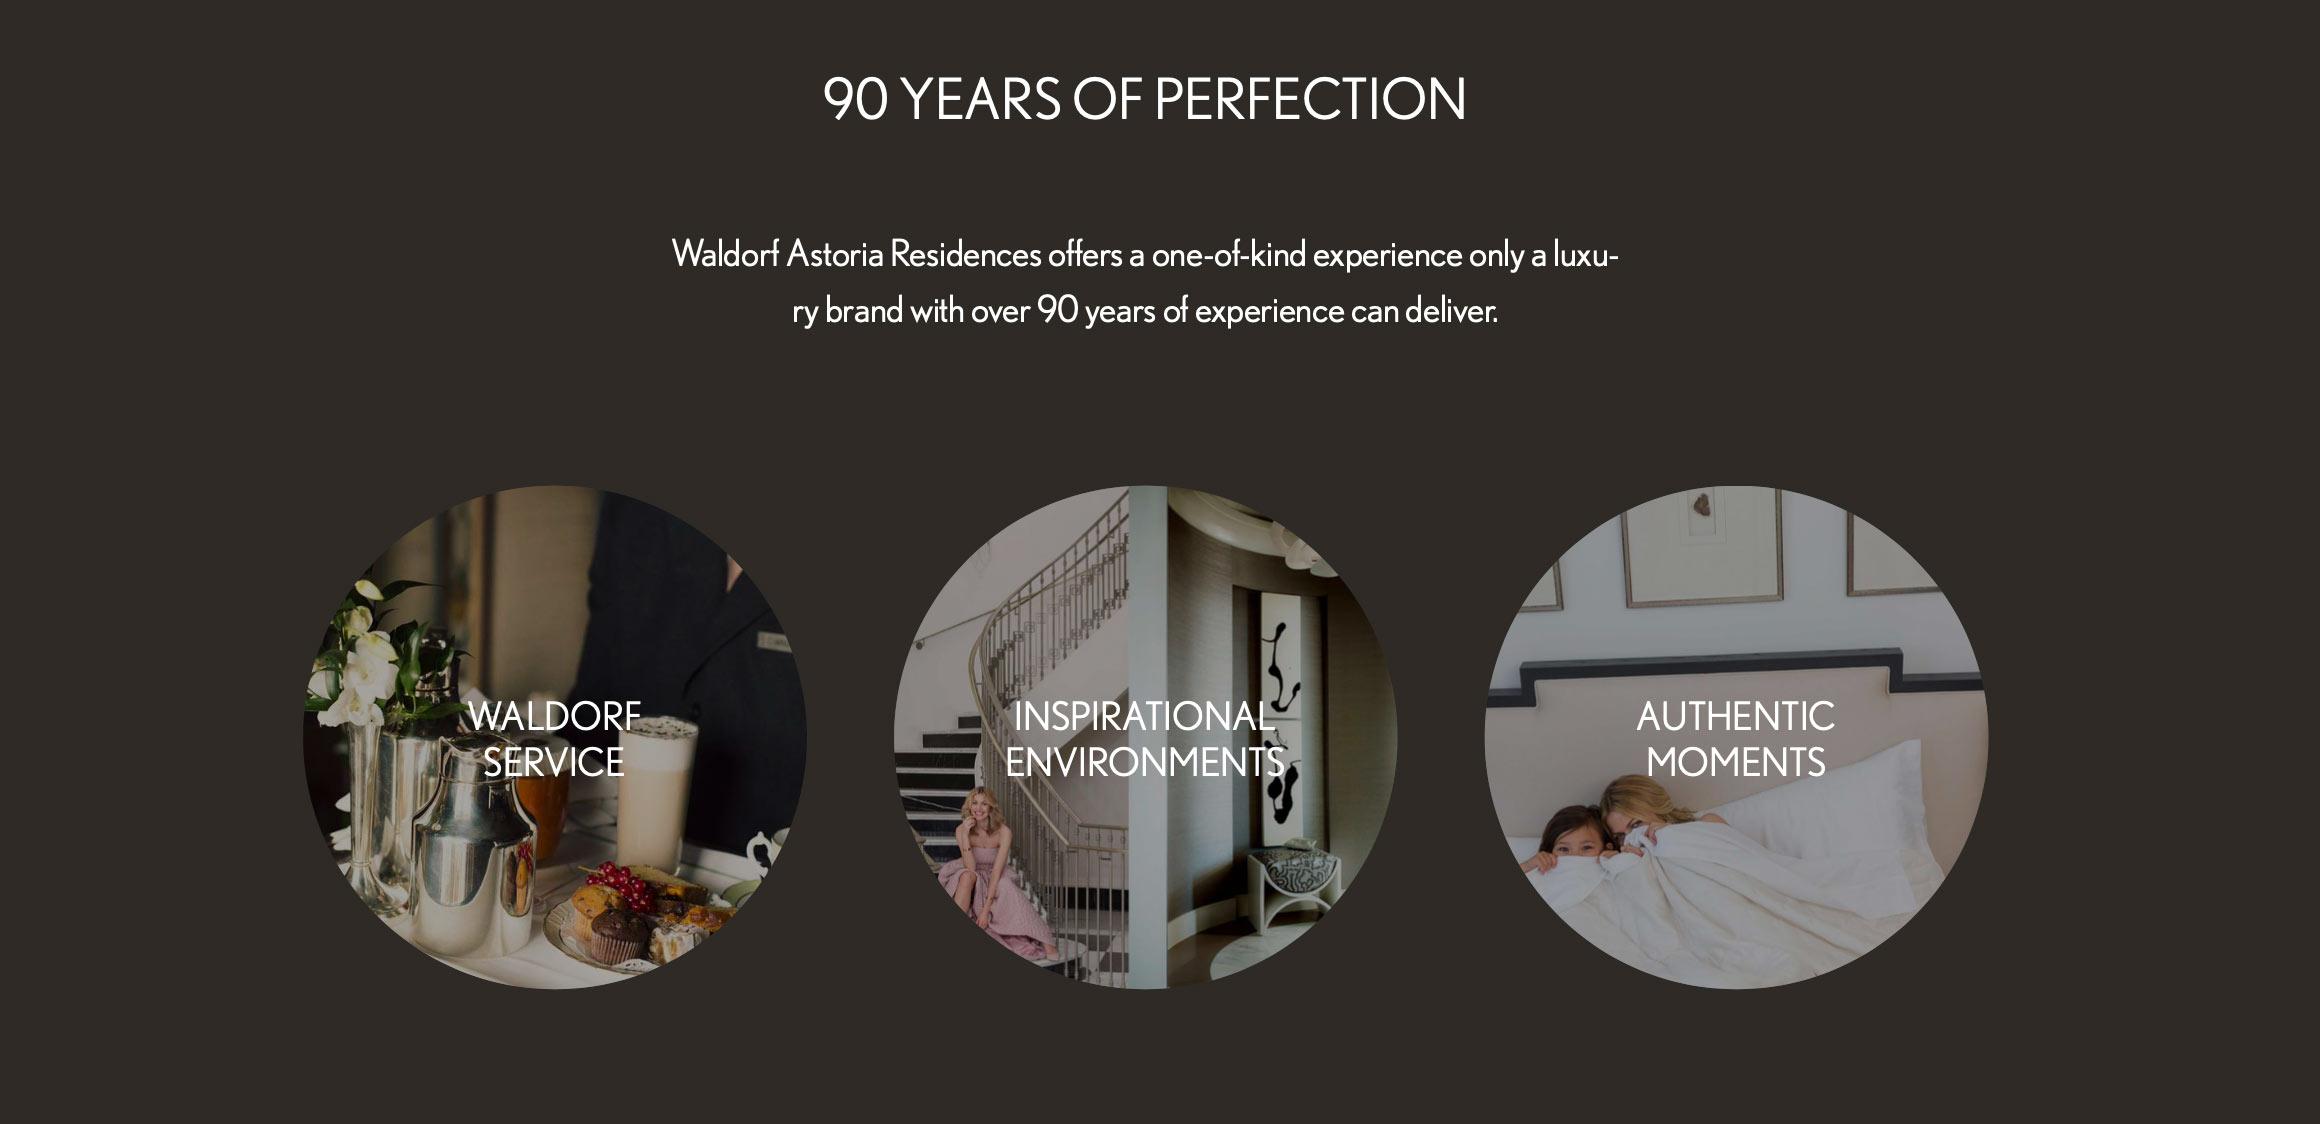 waldorf-astoria-miami-residences-condos-preconstrucion-florida-new-york1